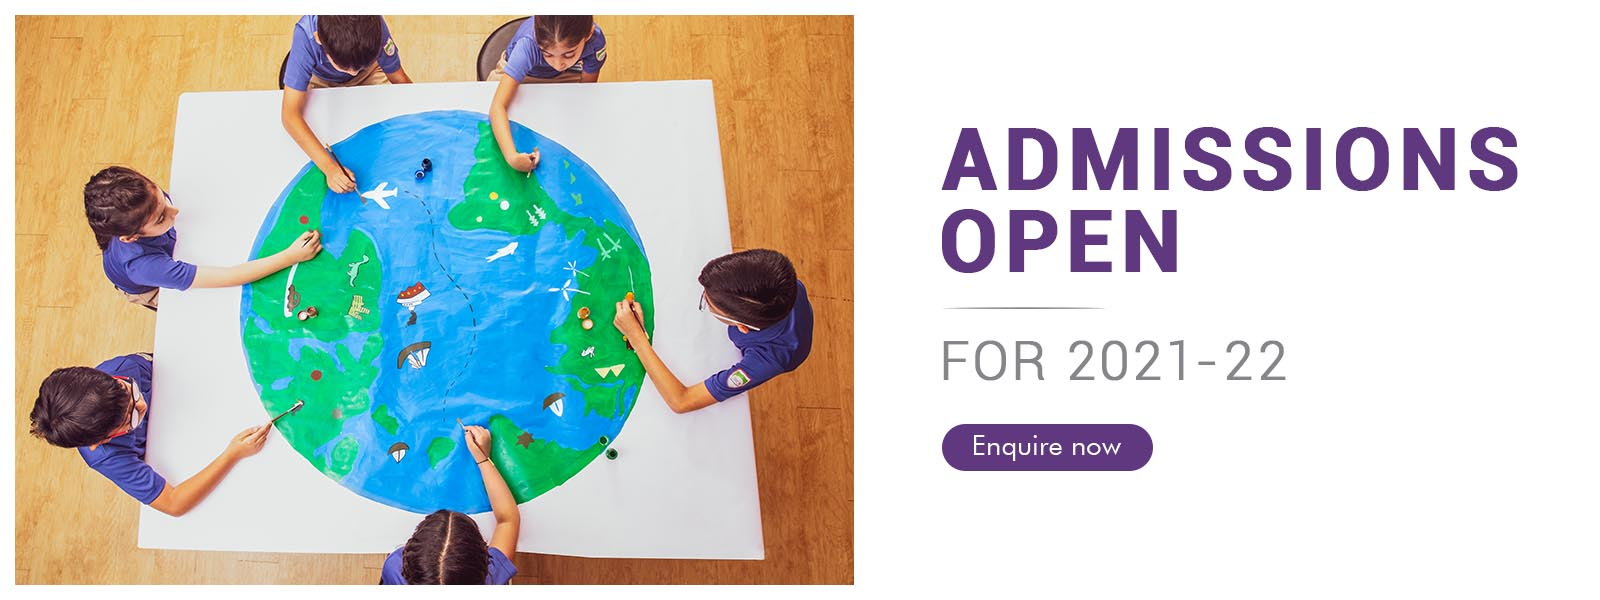 Admissions Open JBCN Parel